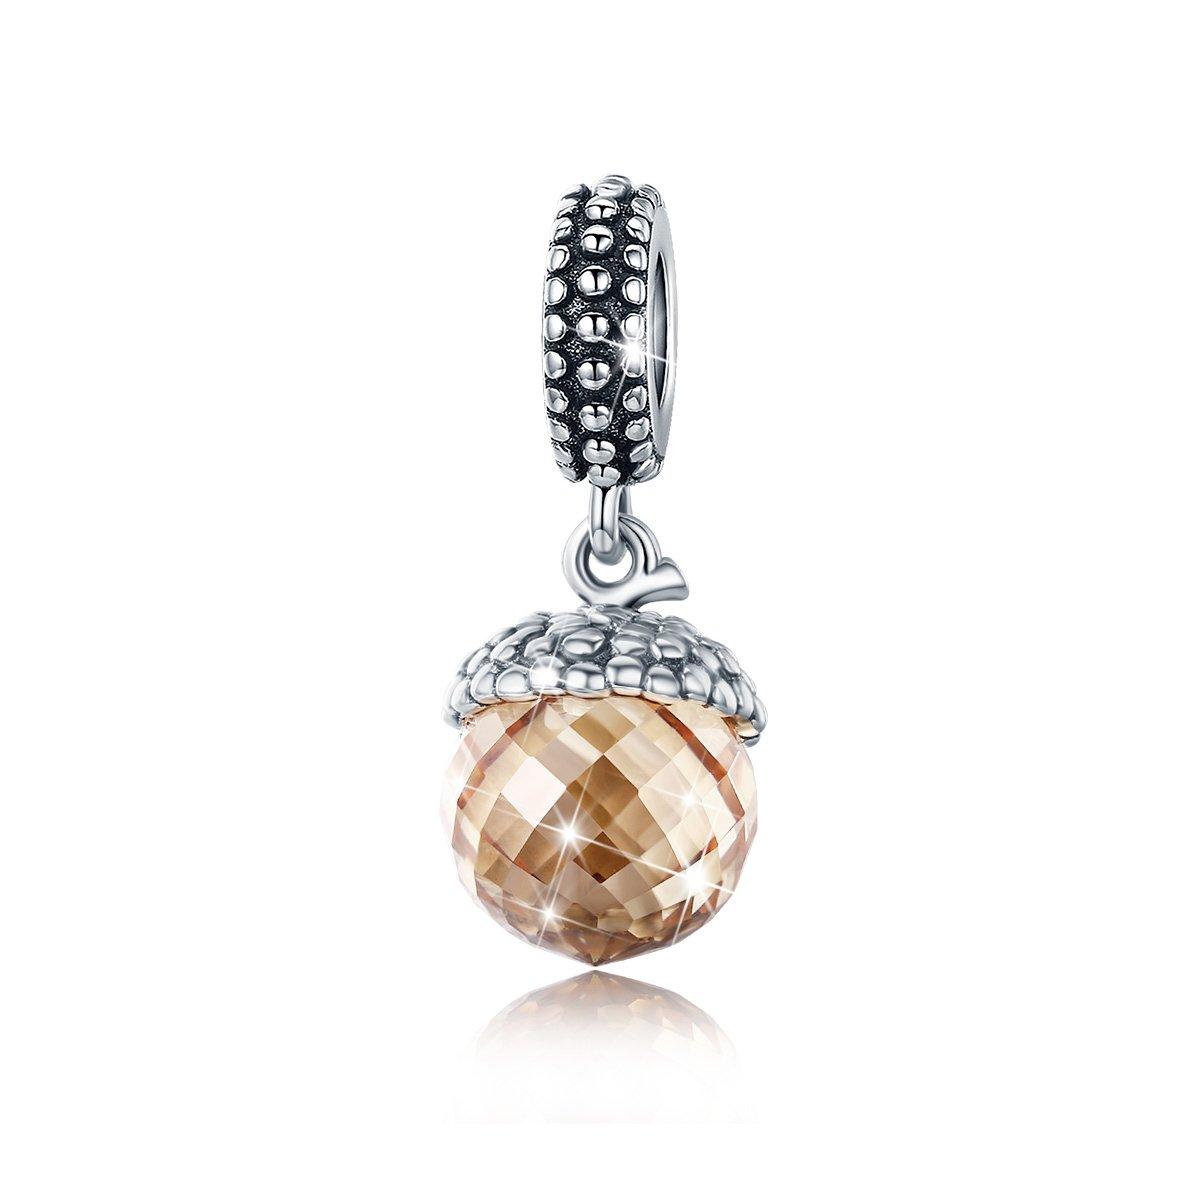 BAMOER 925 Sterling Silver Dangle Filbert Nut Charm Pendant fit Bracelet and Necklace DIY Jewelry